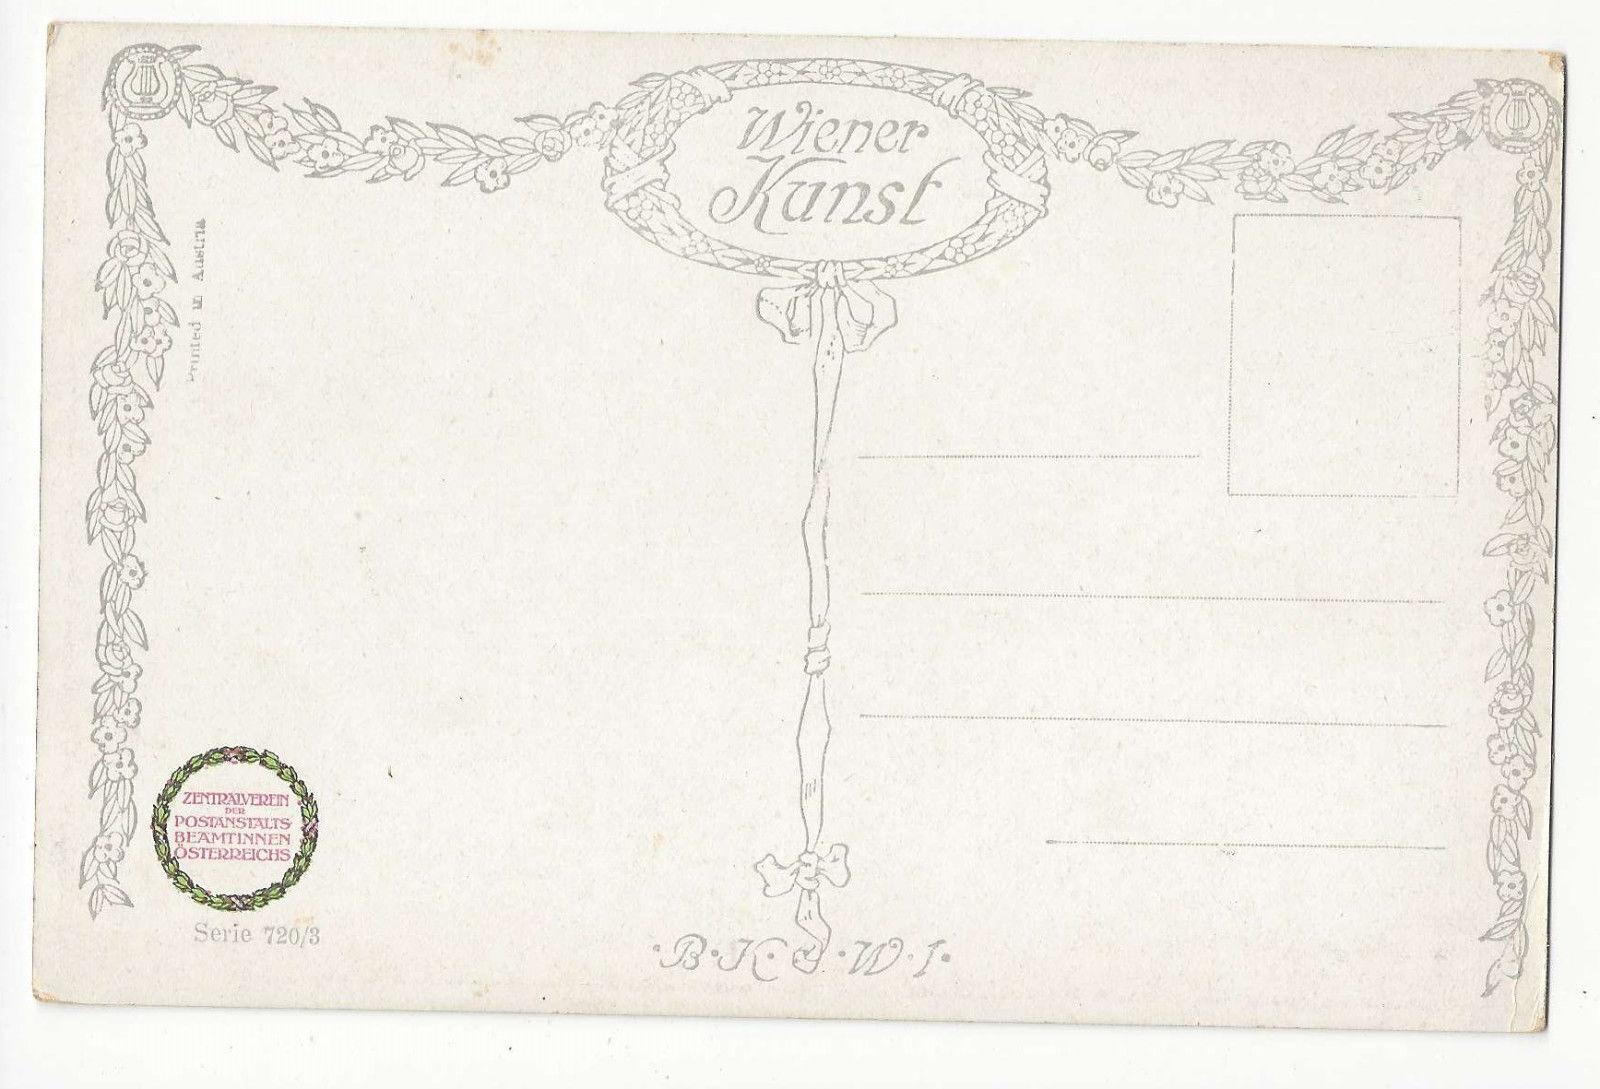 Wiener Kunst Vintage Austrian Art Postcard Serie 720/3 ca 1913